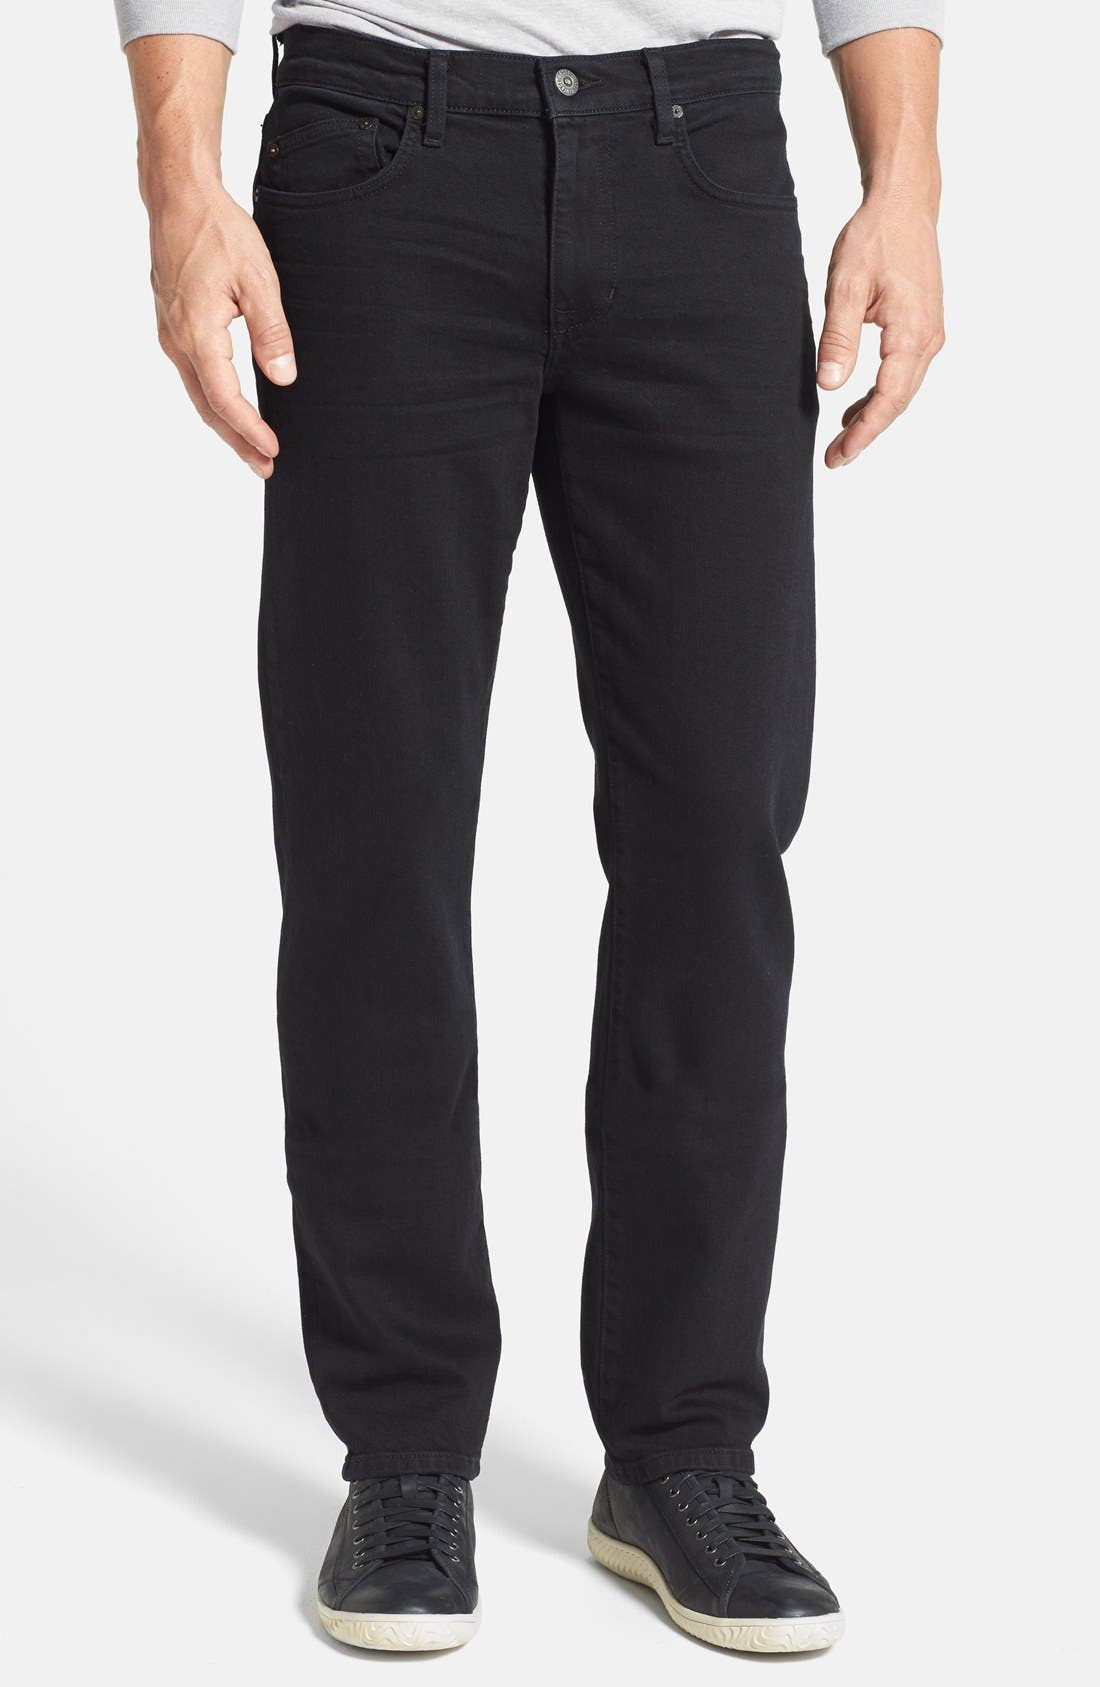 Main Image - Joe's 'Brixton' Slim Fit Jeans (Zayden)